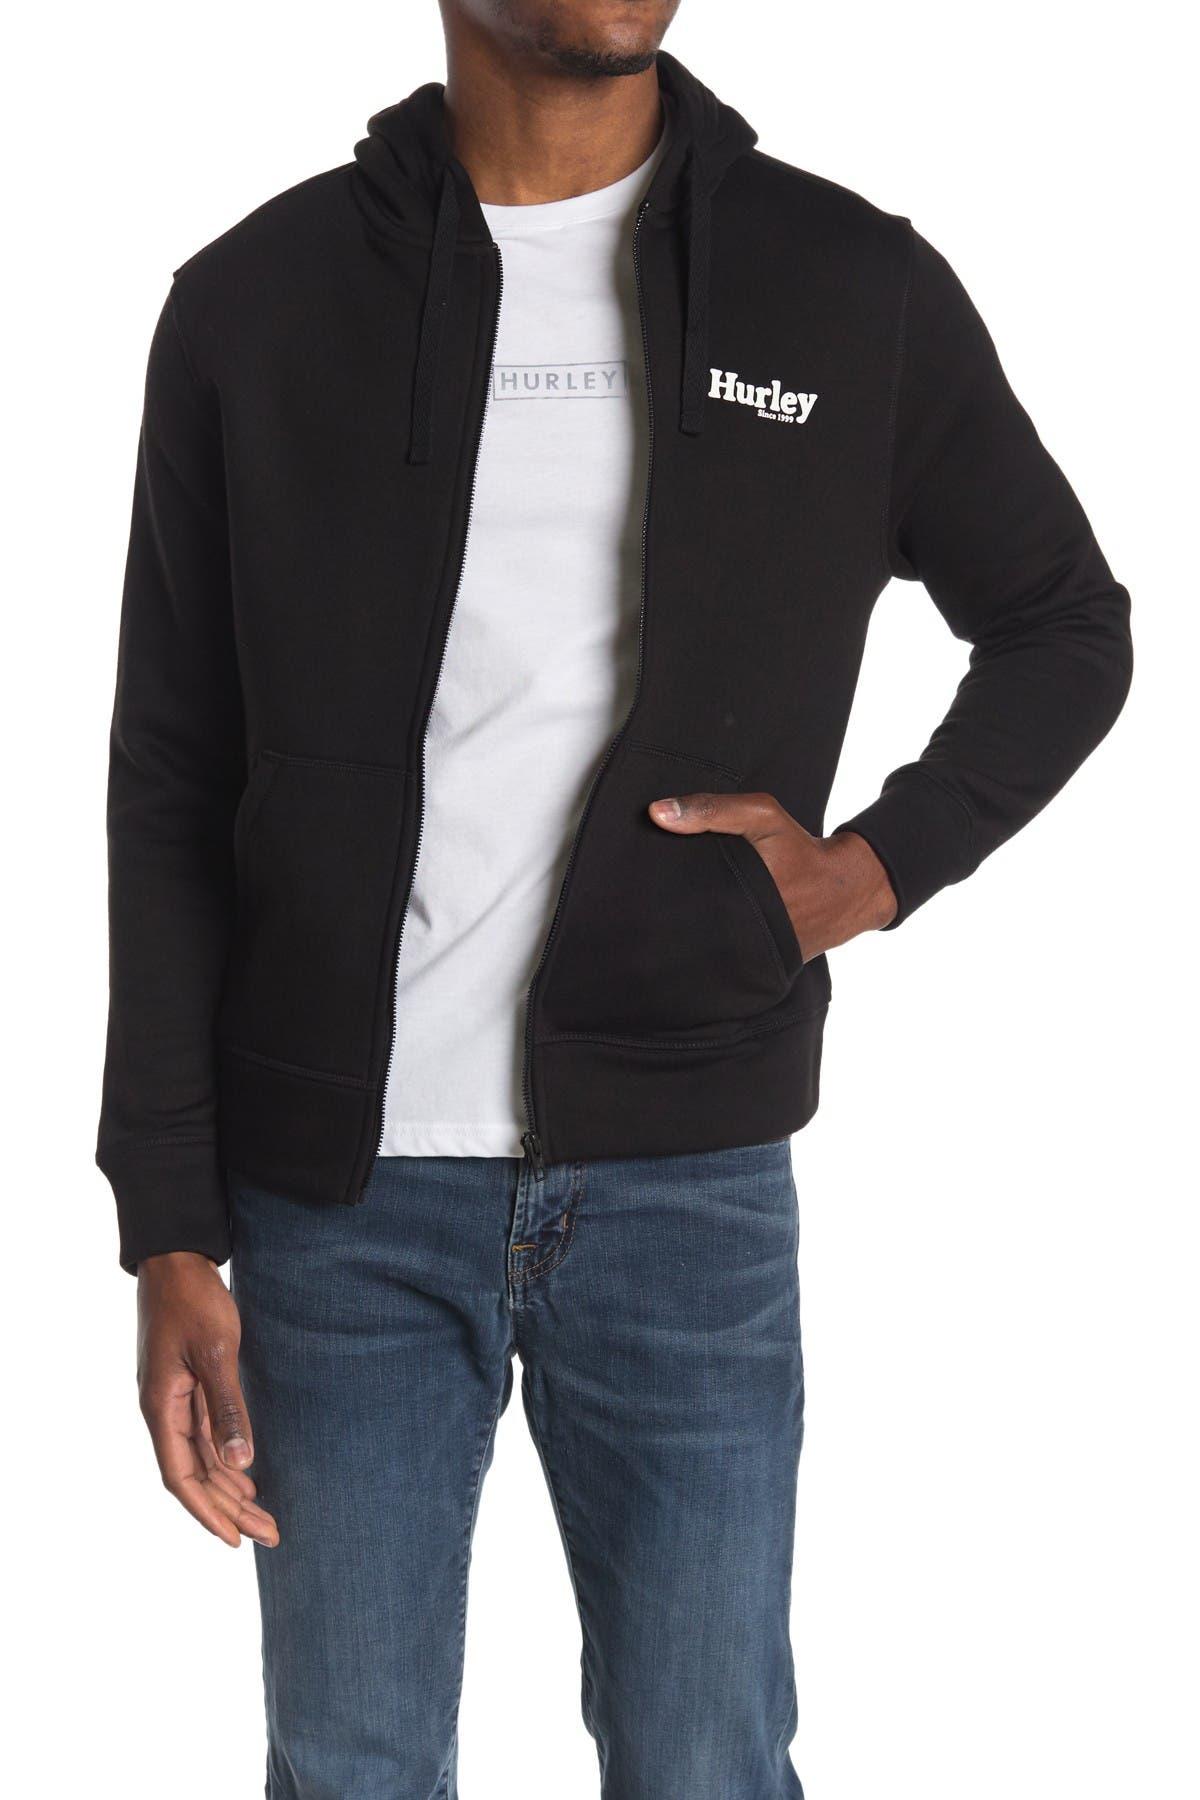 Image of Hurley Logo Fleece Zip Hoodie